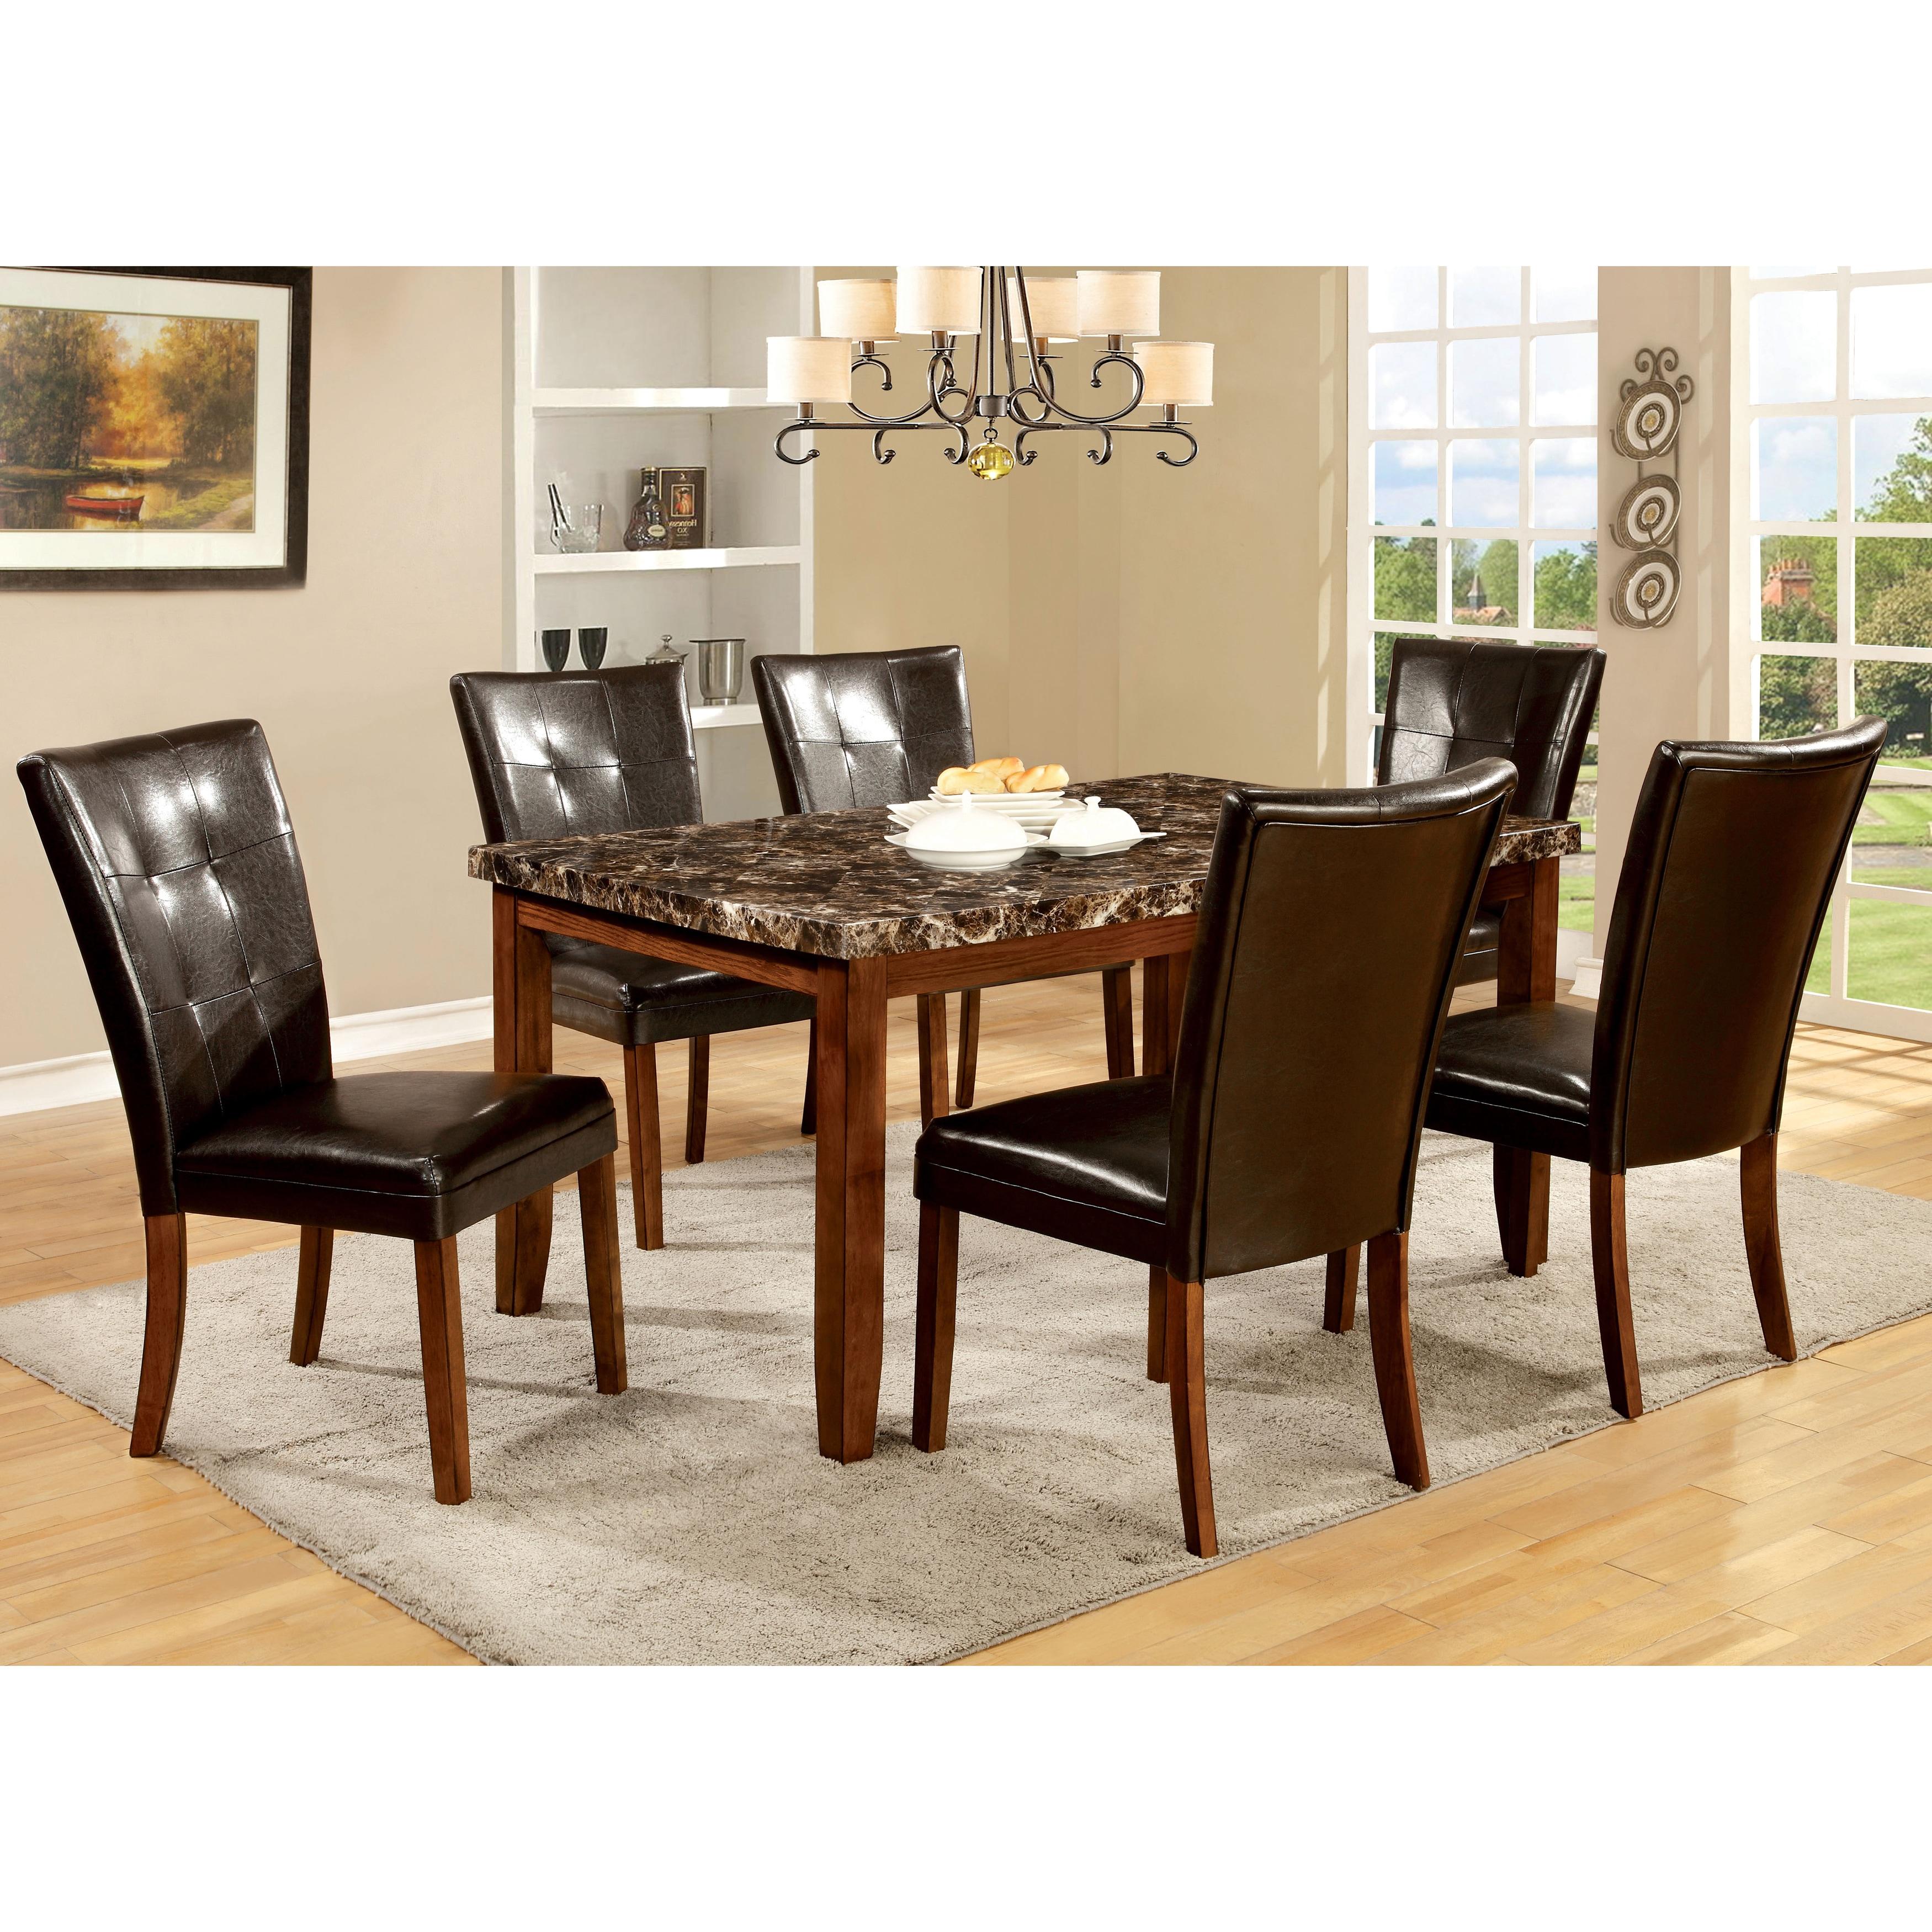 Furniture of America Hughfort 7-Piece Antique Oak Dining ...